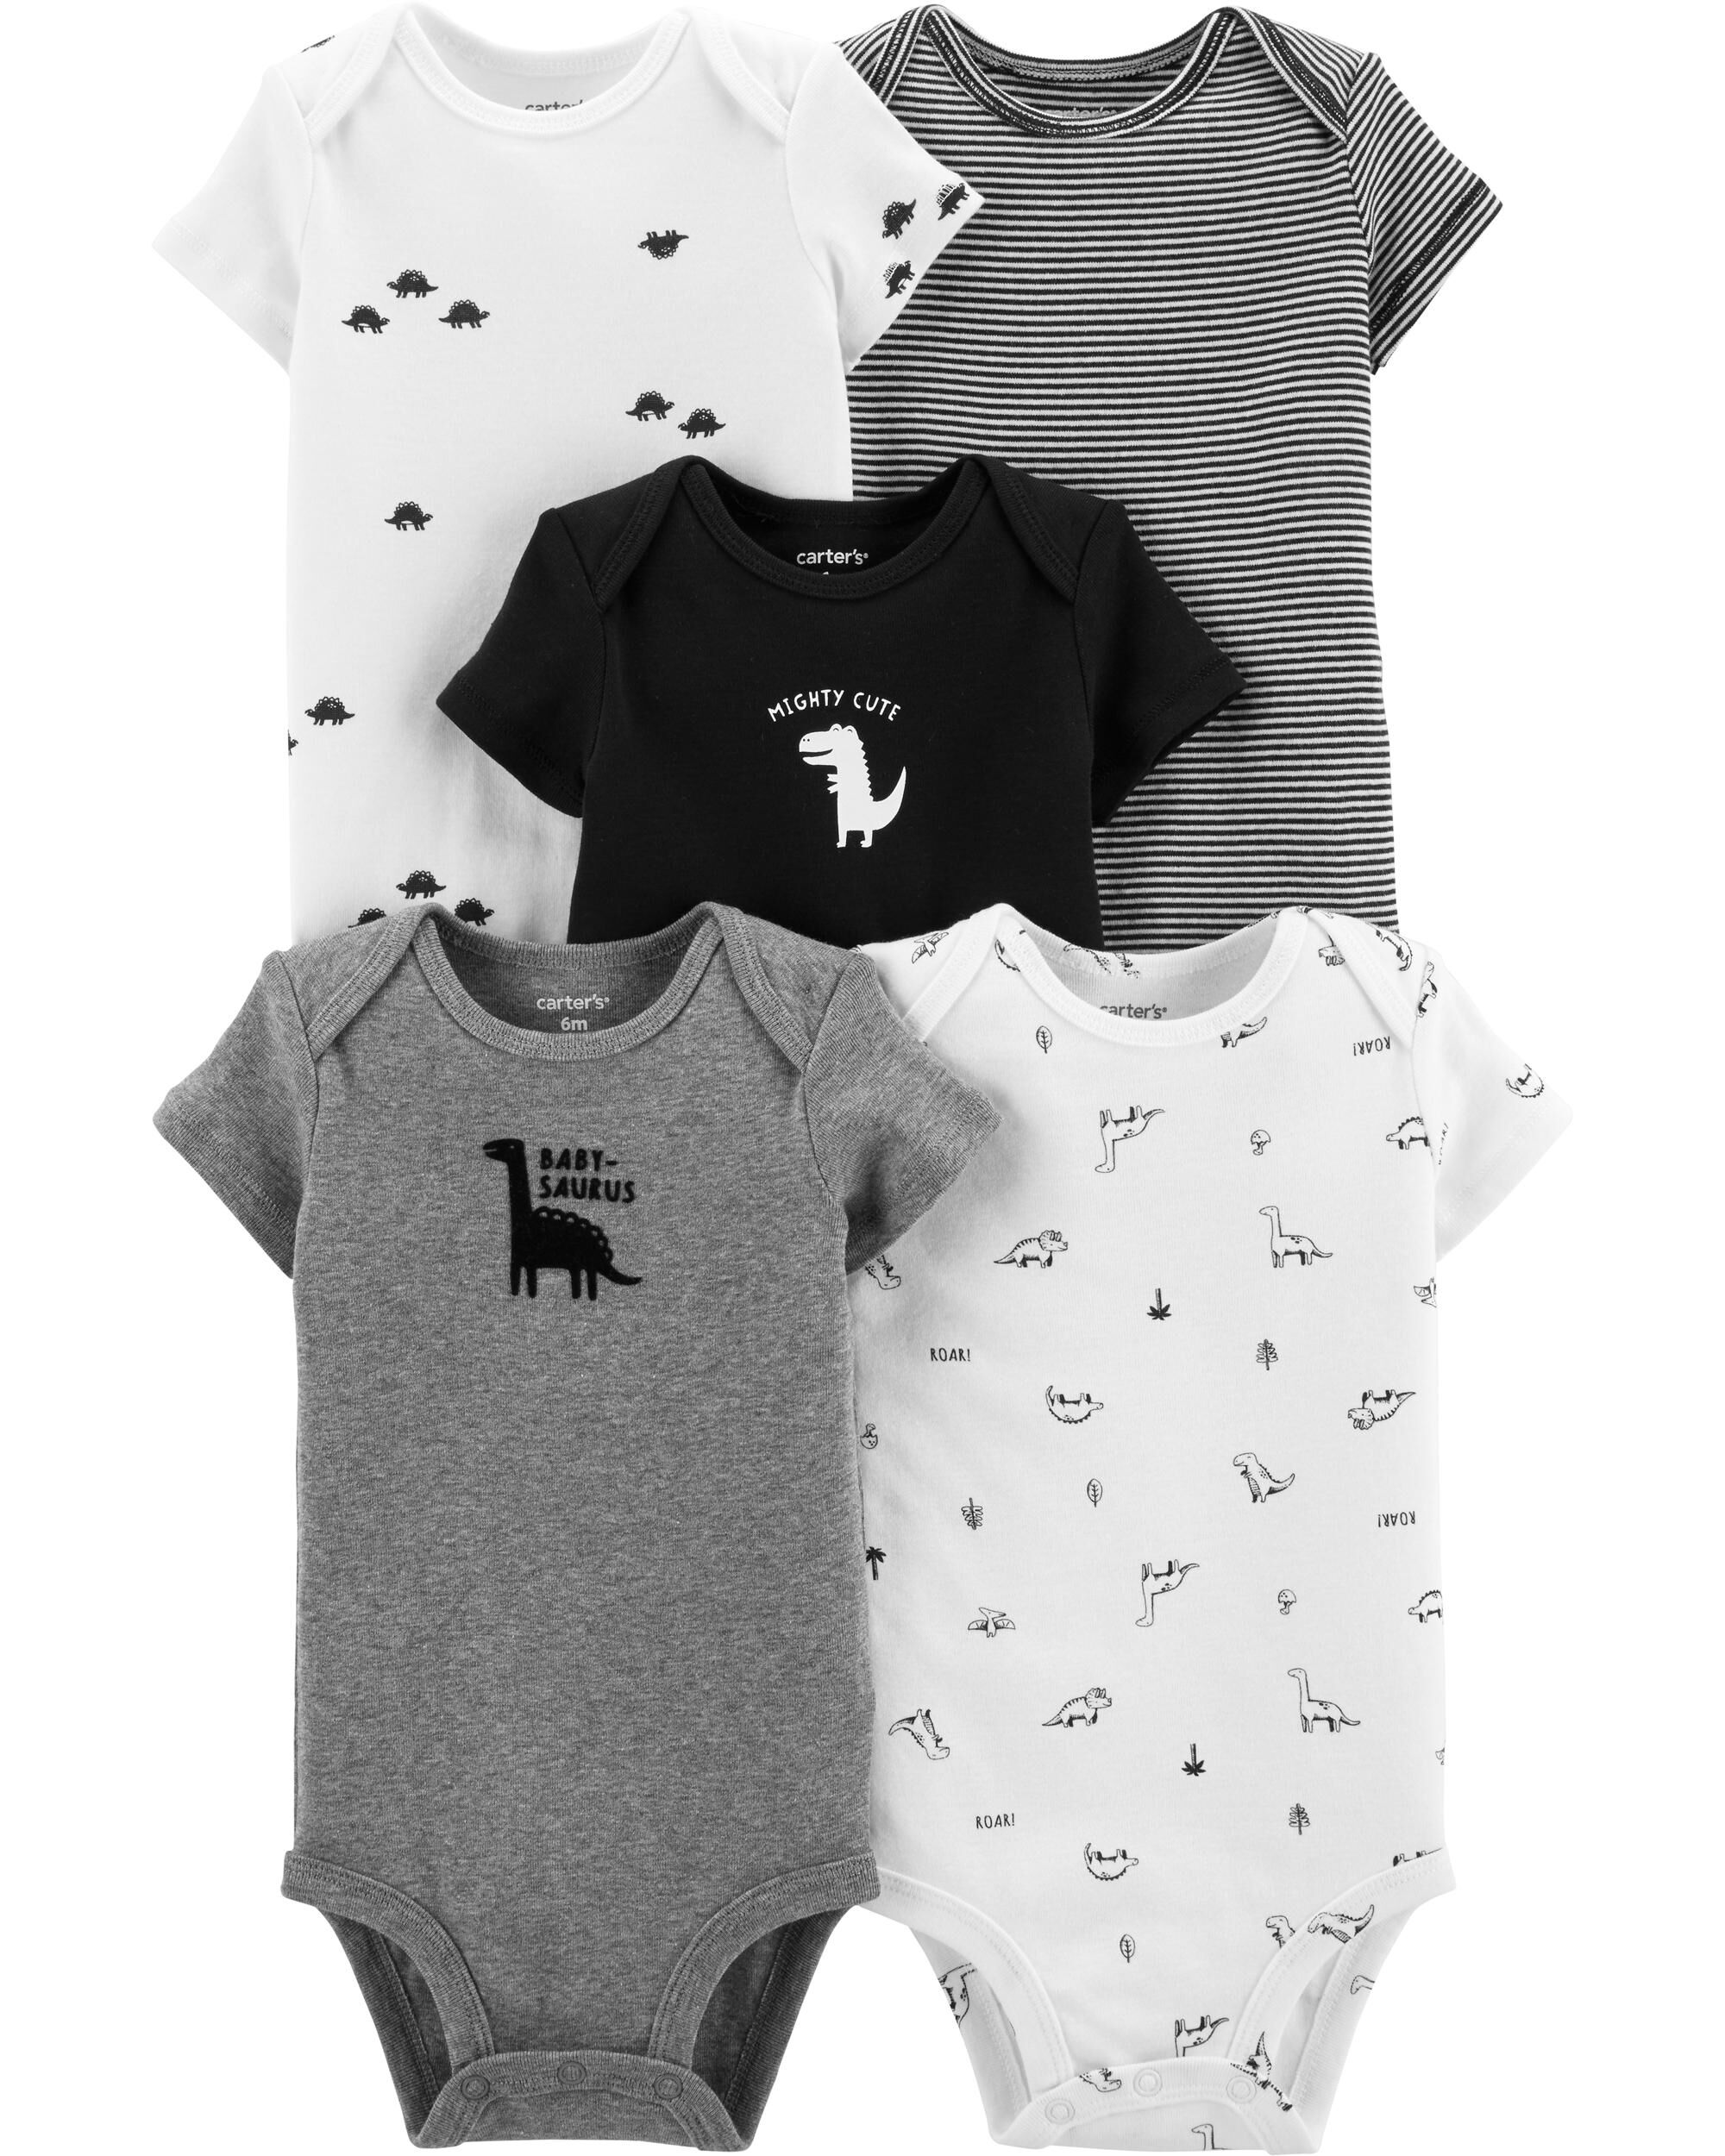 *CLEARANCE* 5-Pack Dinosaur Original Bodysuits